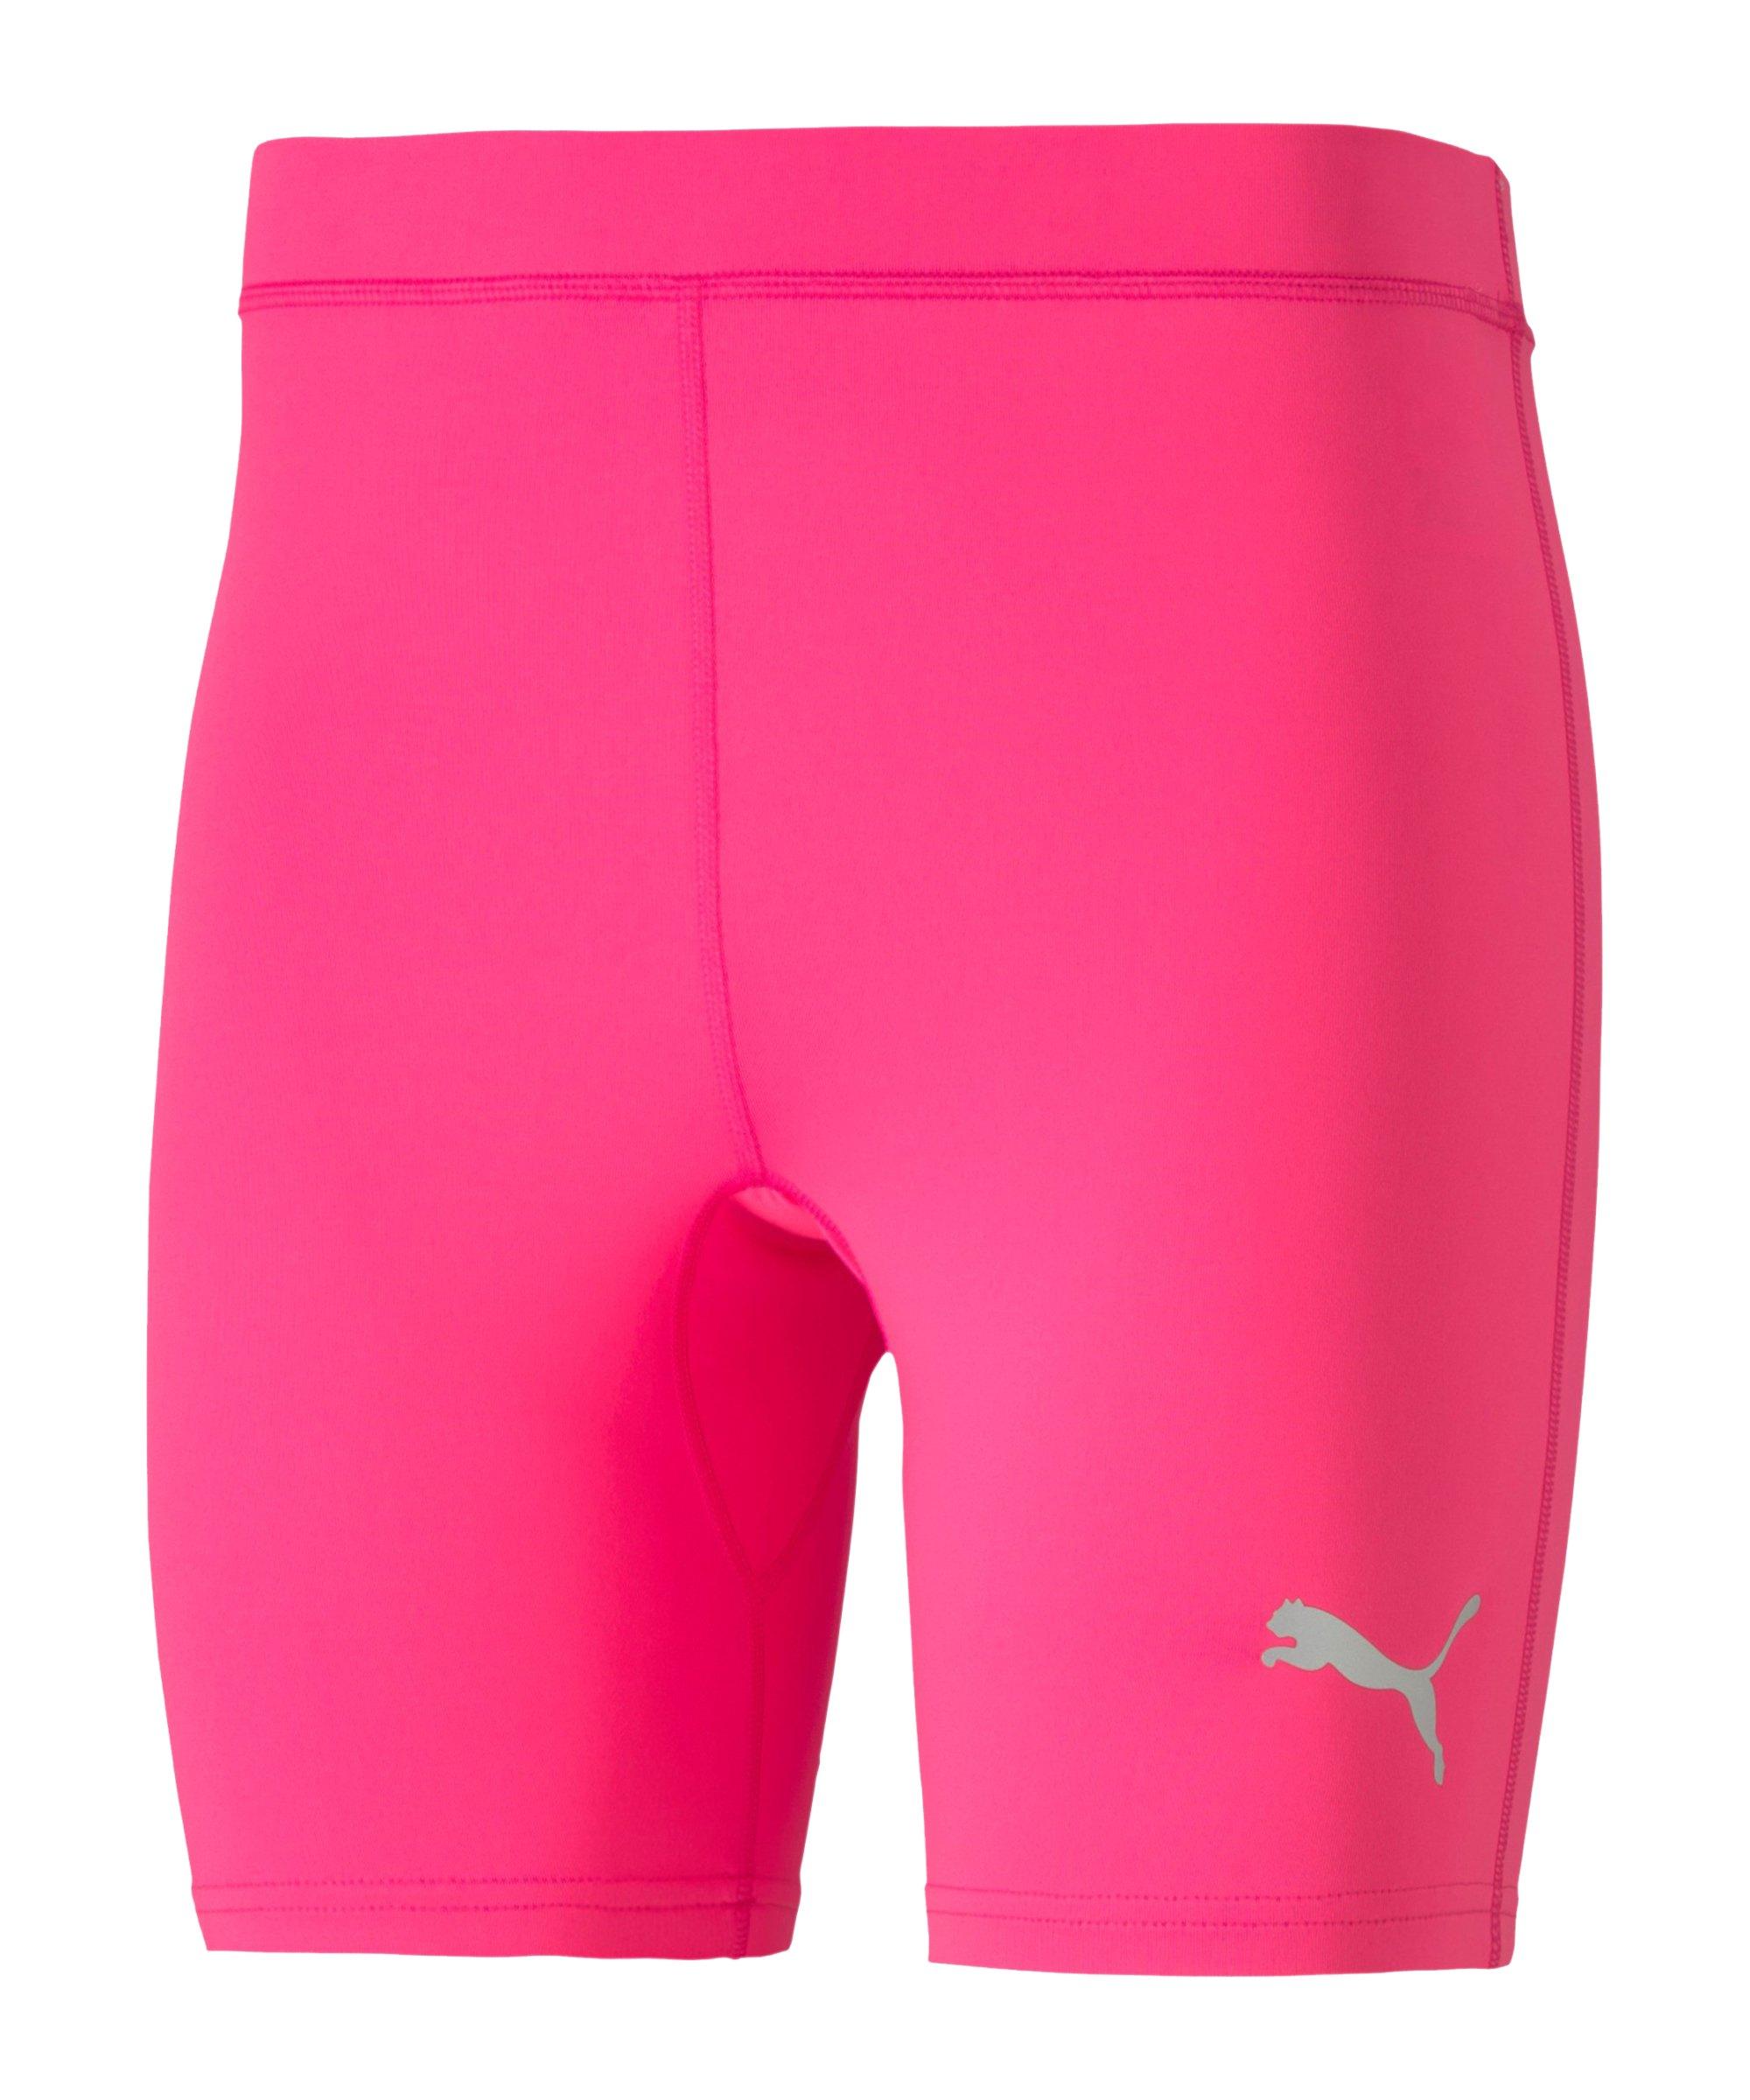 PUMA LIGA Baselayer Short Pink F31 - pink